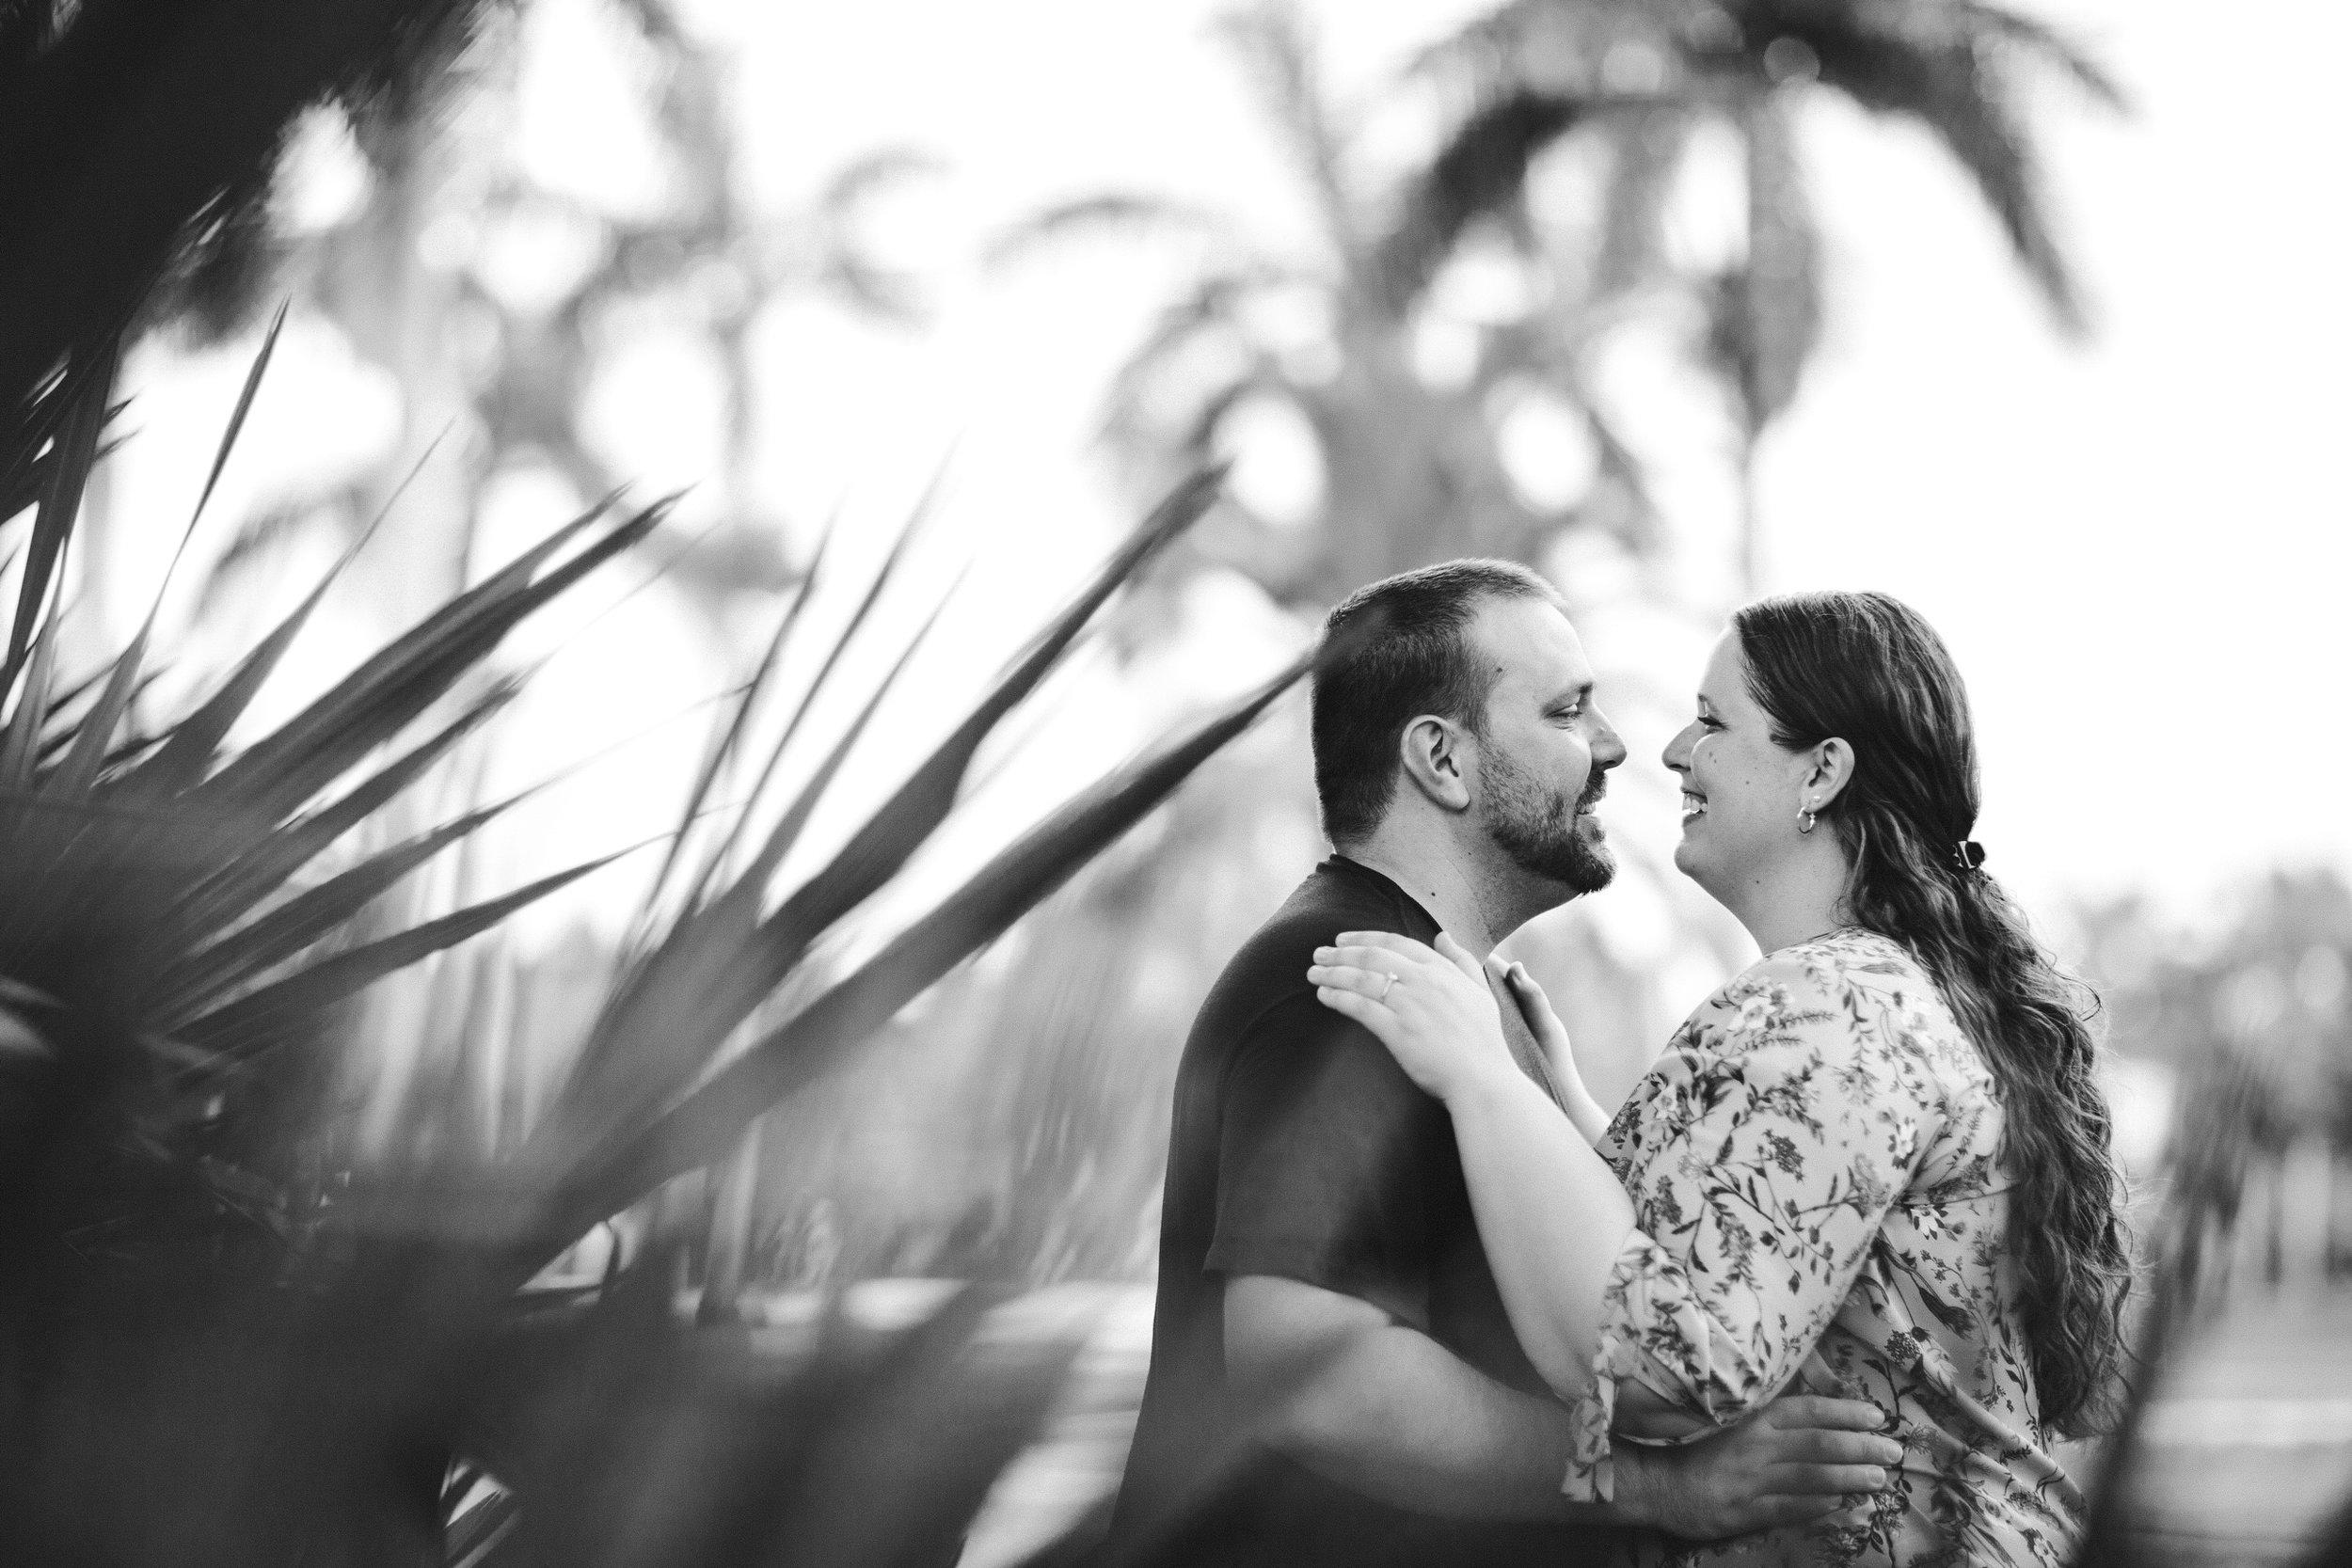 South_Florida_Engagement_Session_Wedding_Photographer_Black_And_White_Photograph.jpg